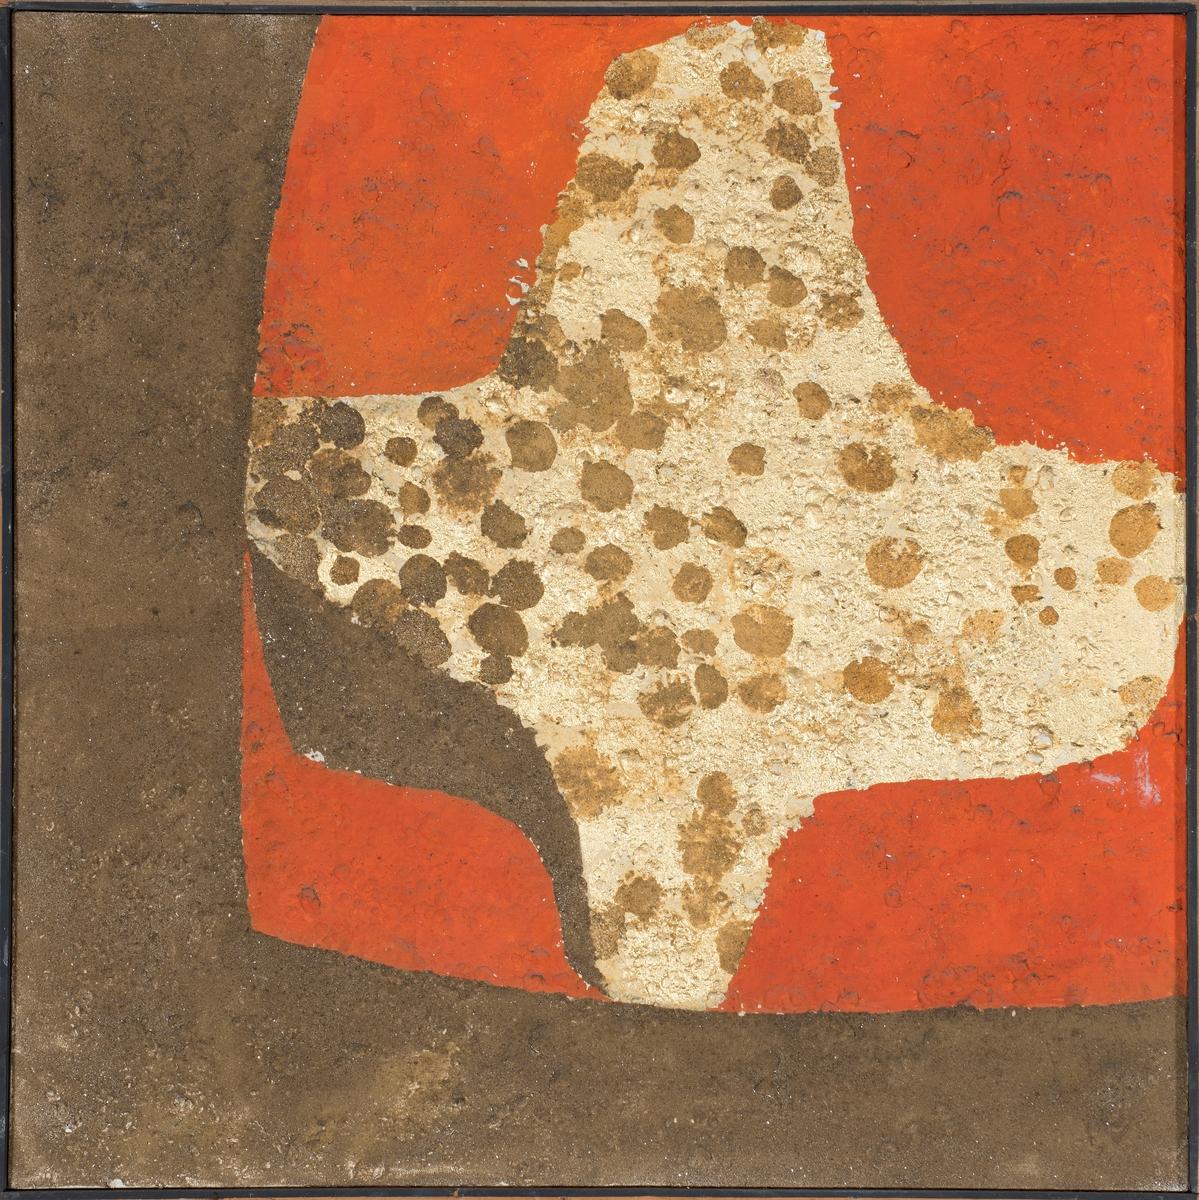 Psaume 150 Peinture 1973